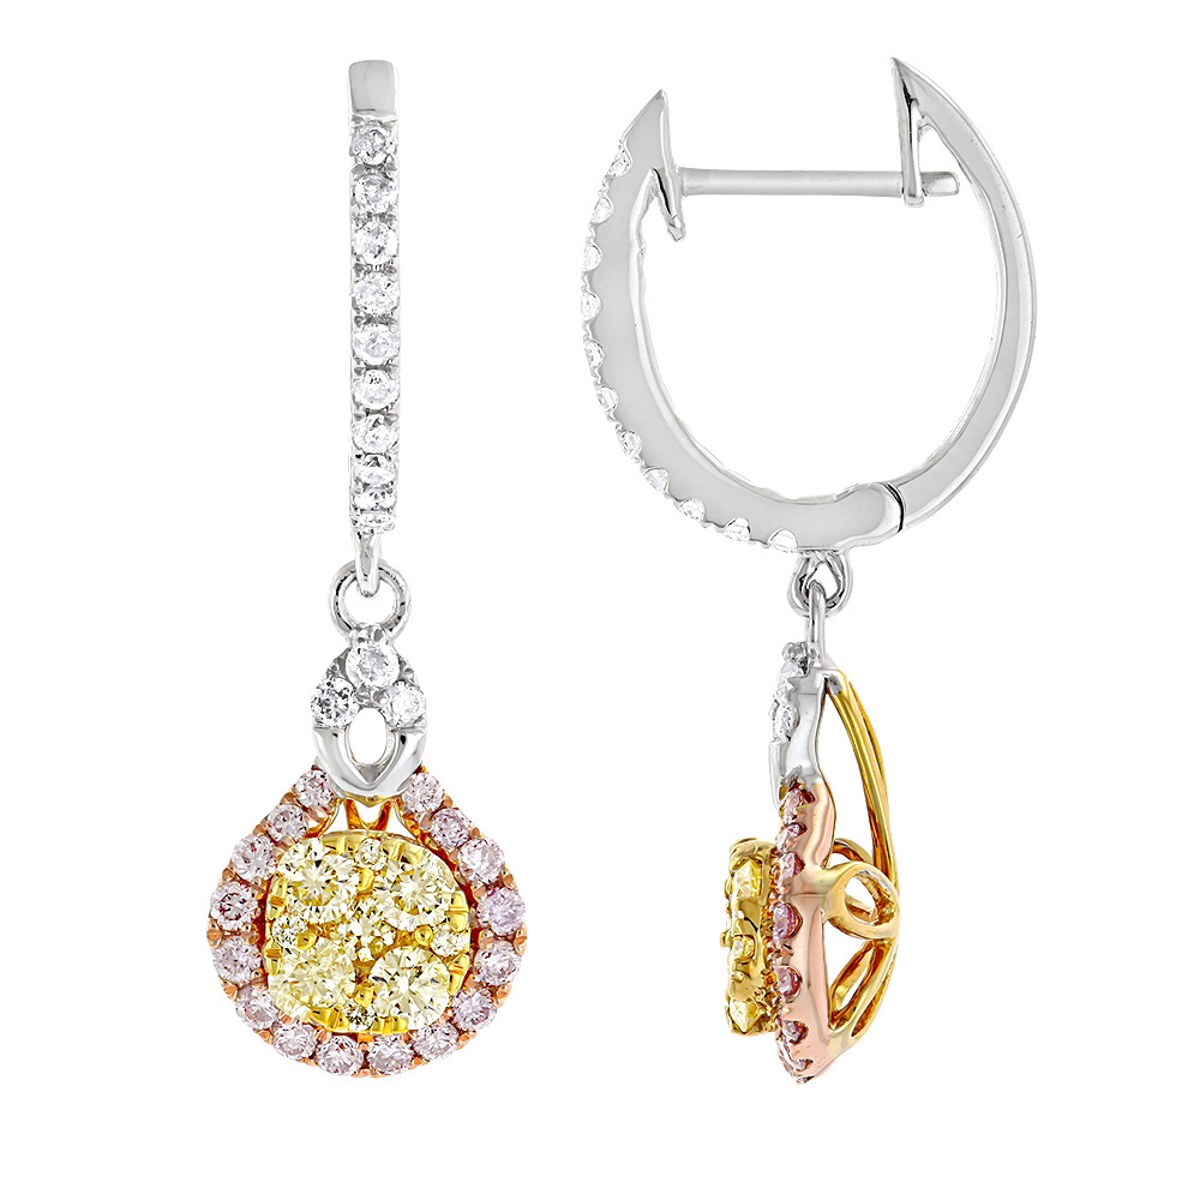 Unique White Yellow Pink Diamond Ladies Drop Earrings by Luxurman 1.3ct